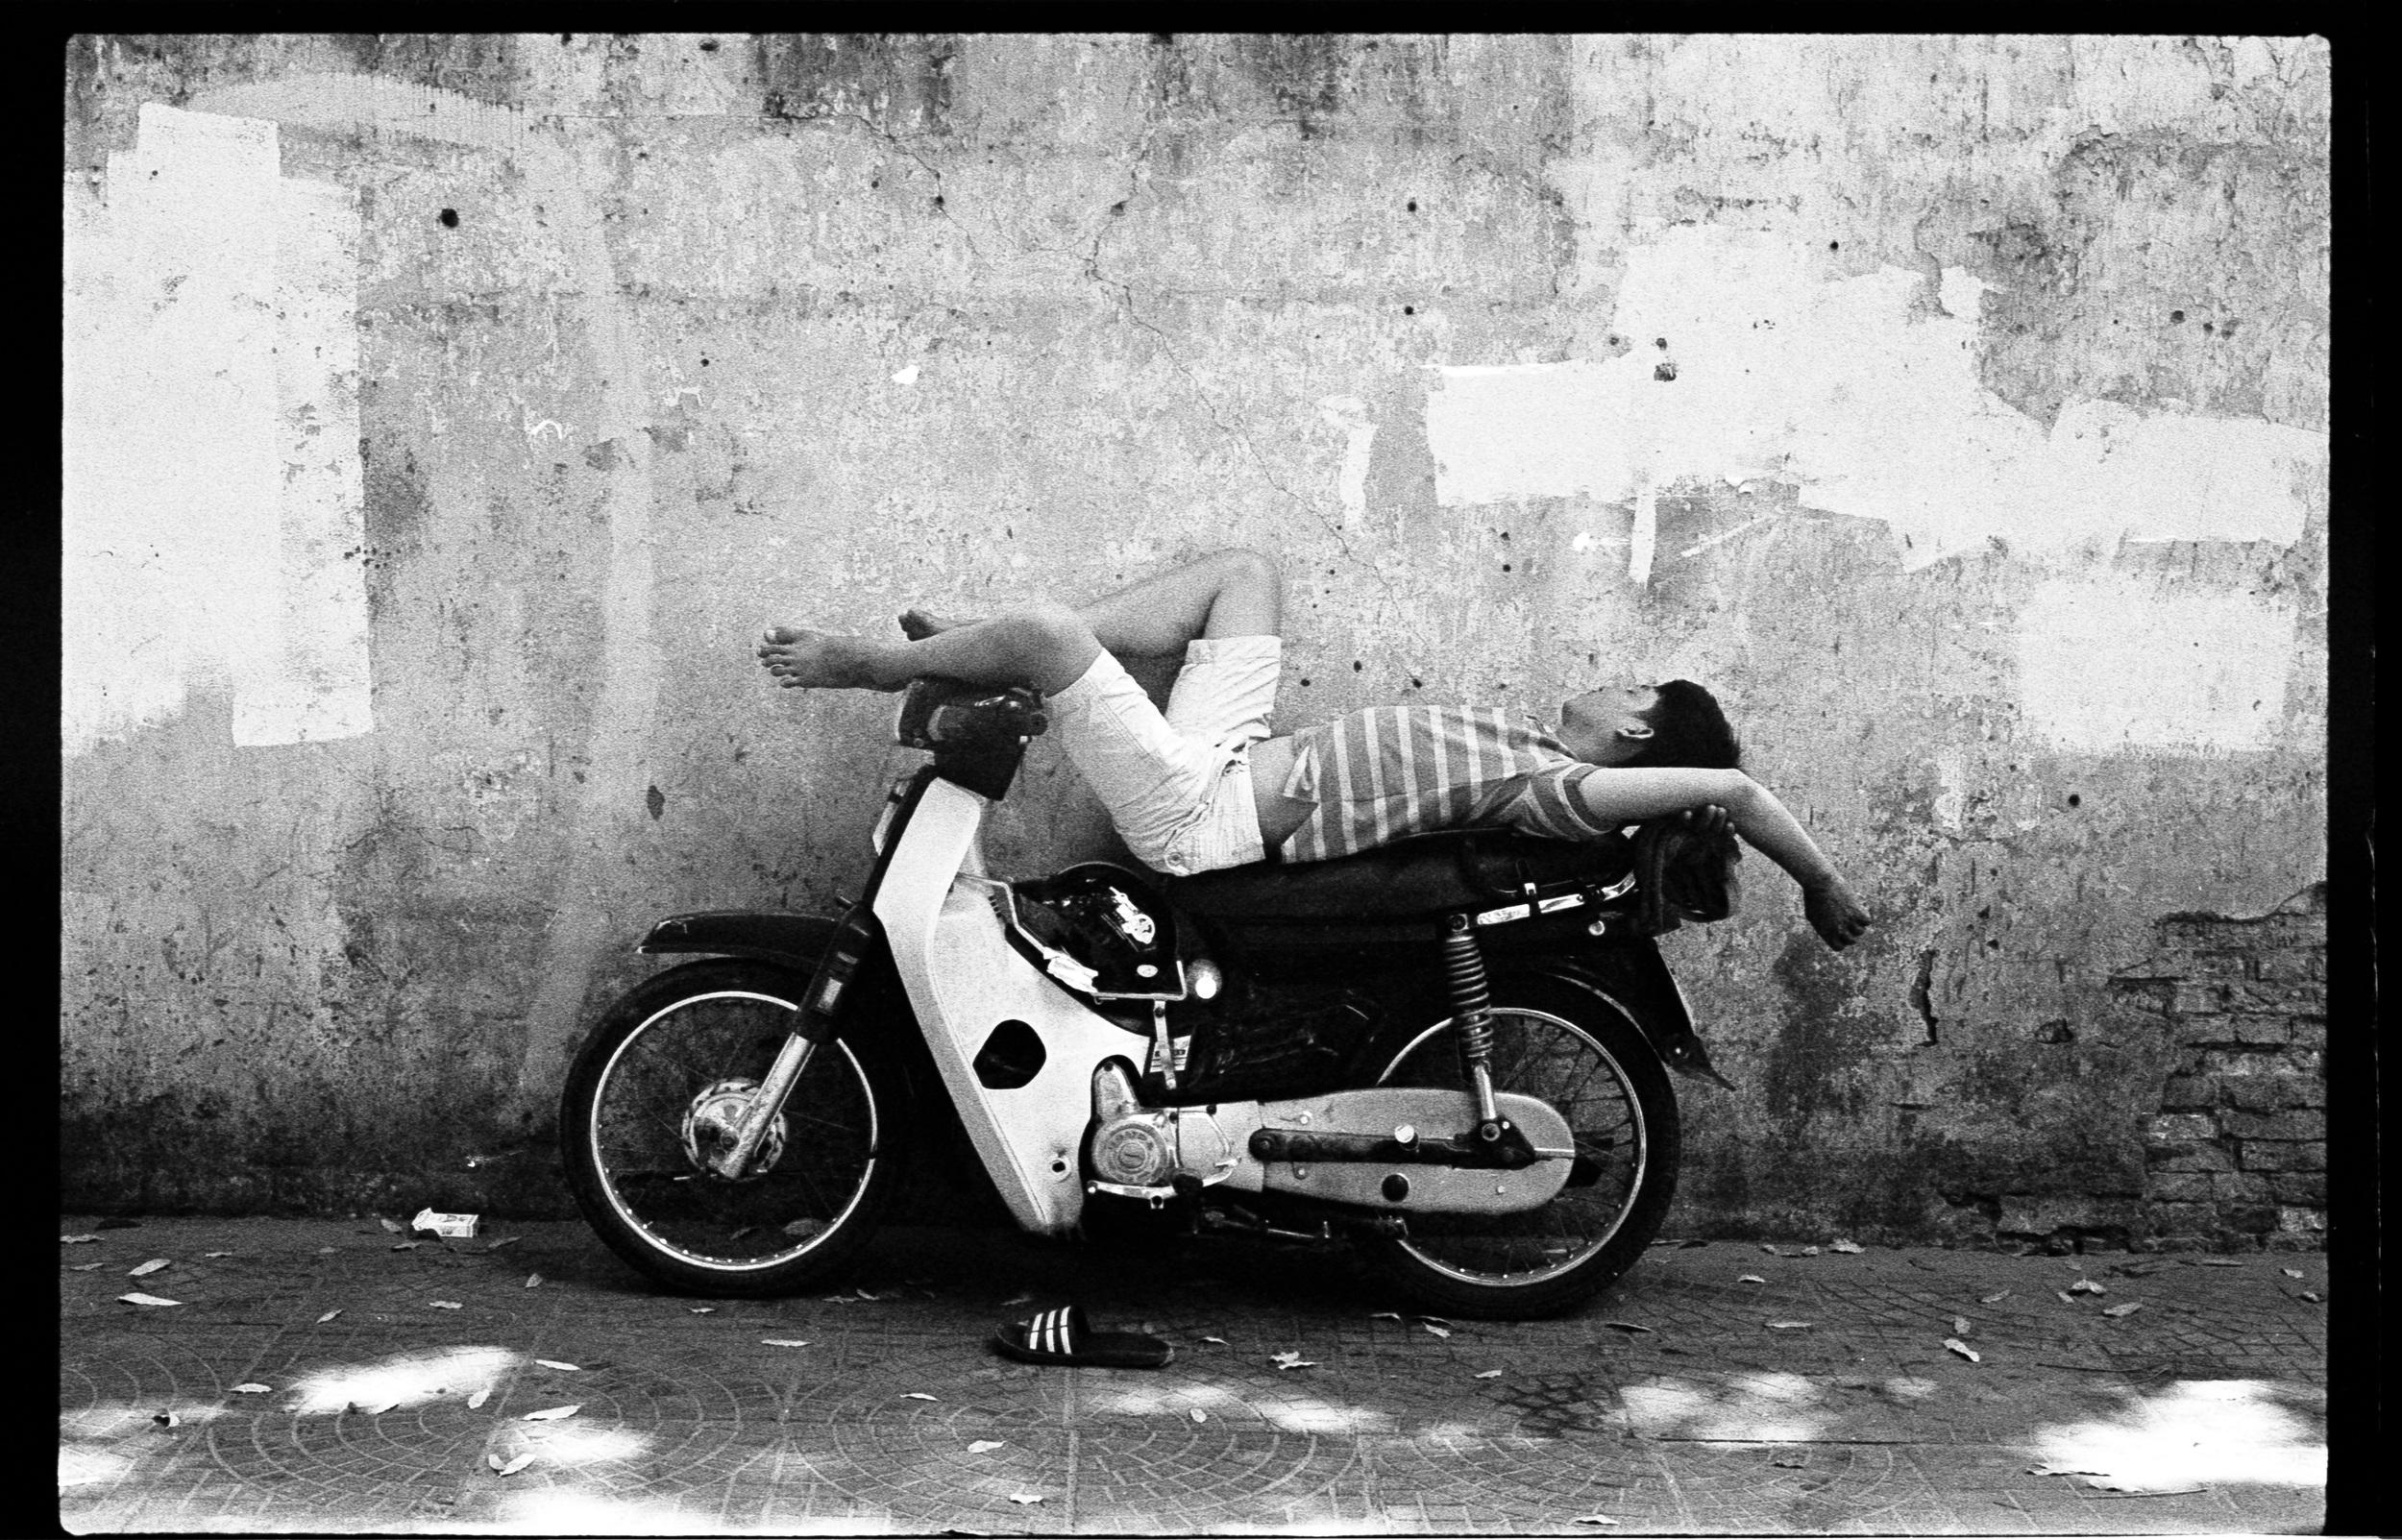 Moped sleeper